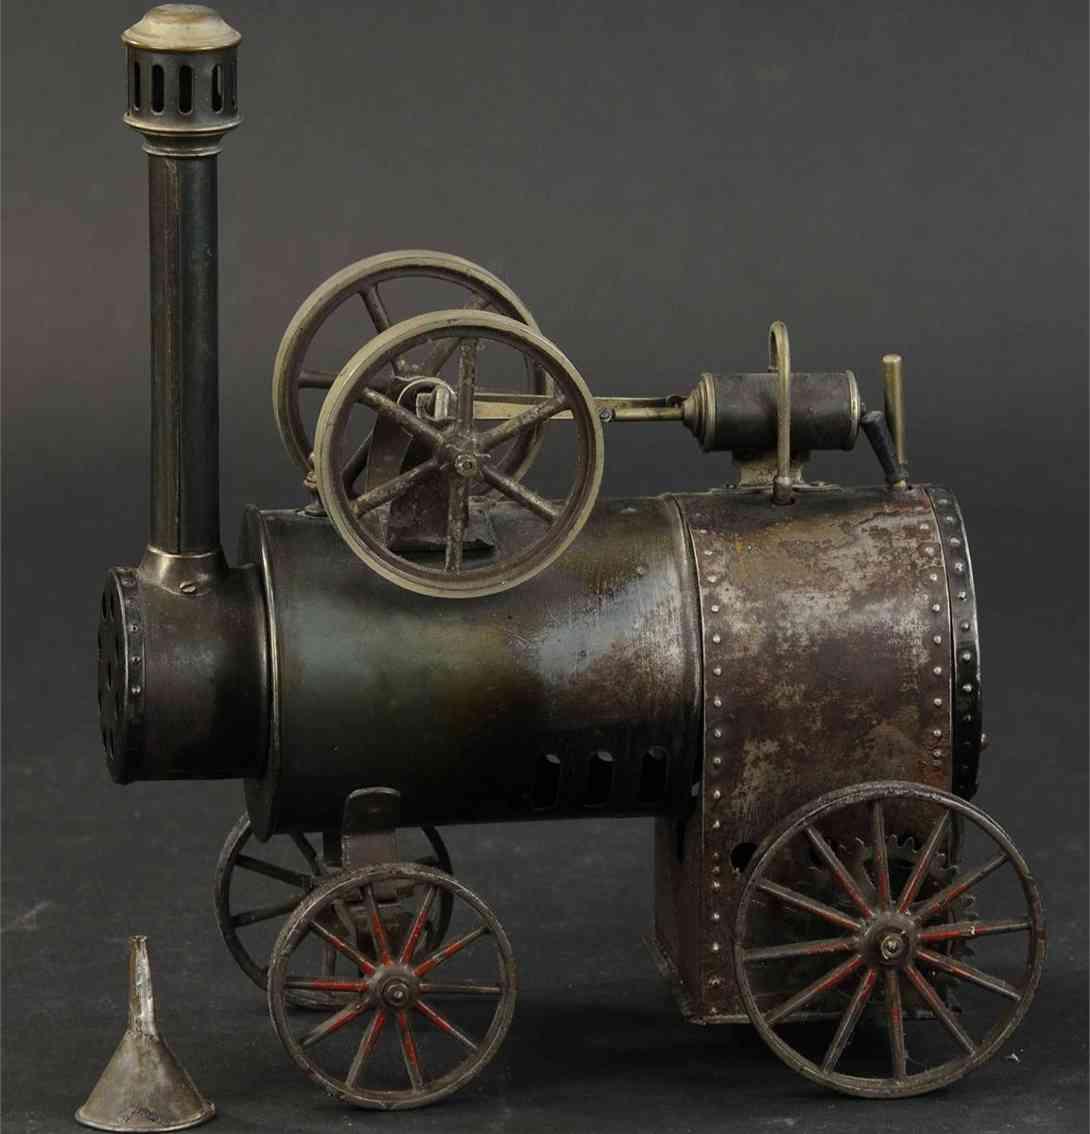 falk josef dampfspielzeug fahrbare lokomobile